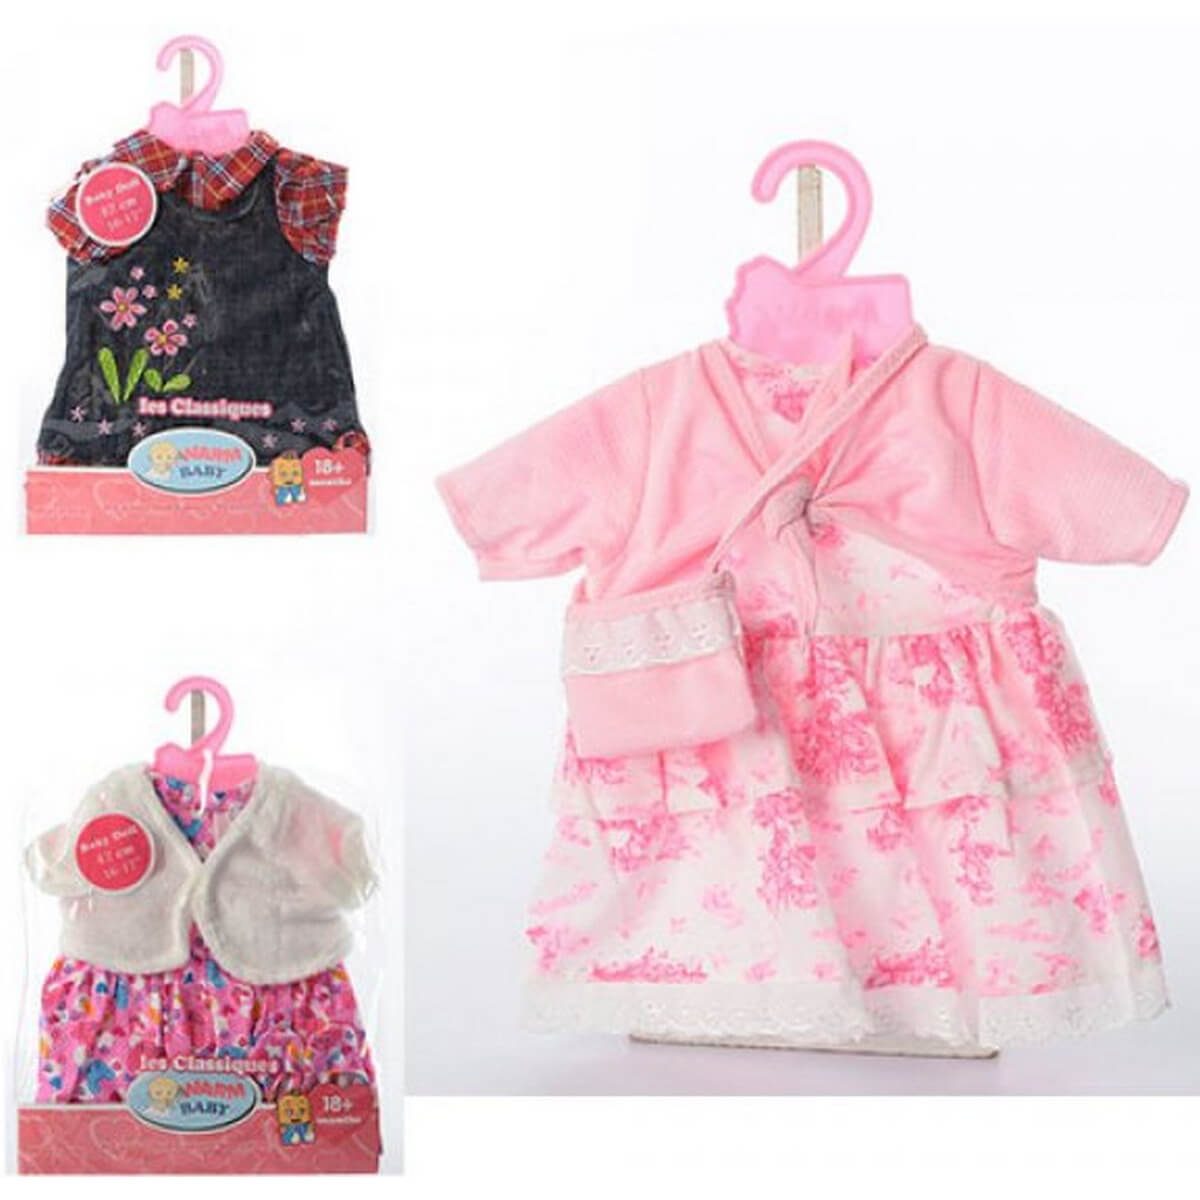 baby doll Одежда для пупса 3 вида BJ-05012ABD